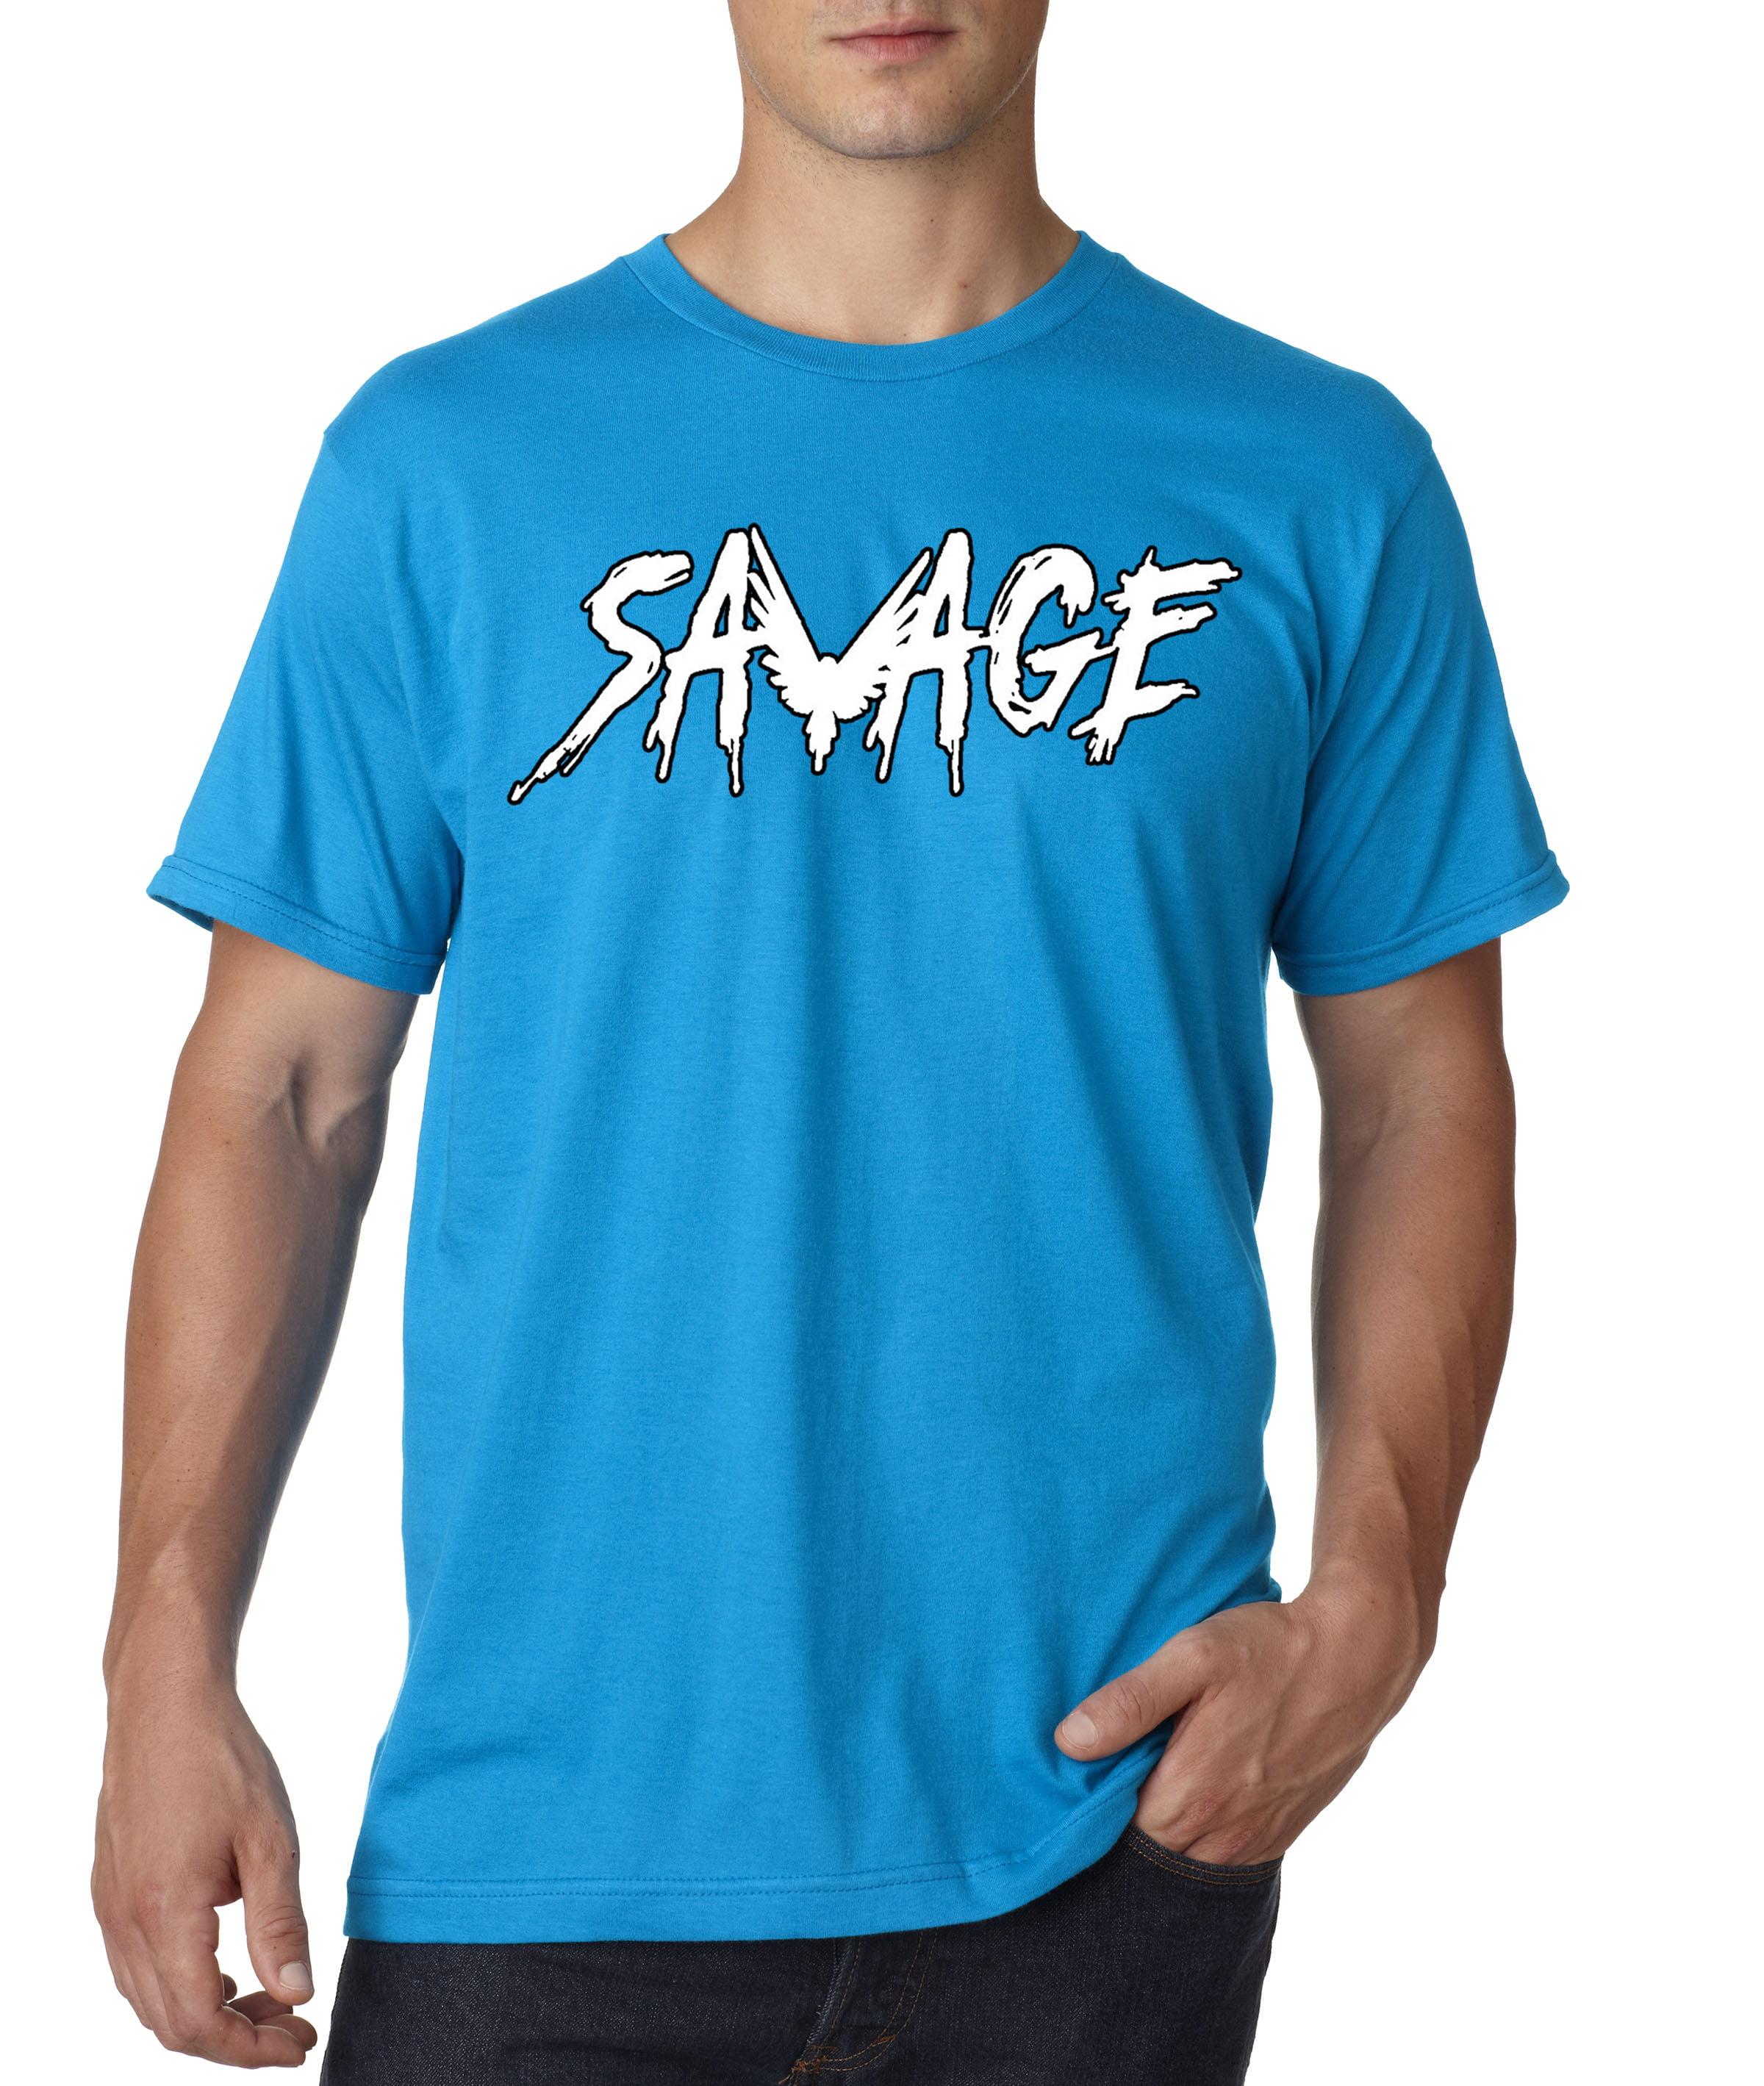 8cb279c315c3c New Way - 788 - Unisex T-Shirt Savage Maverick Logang Logan Paul ...